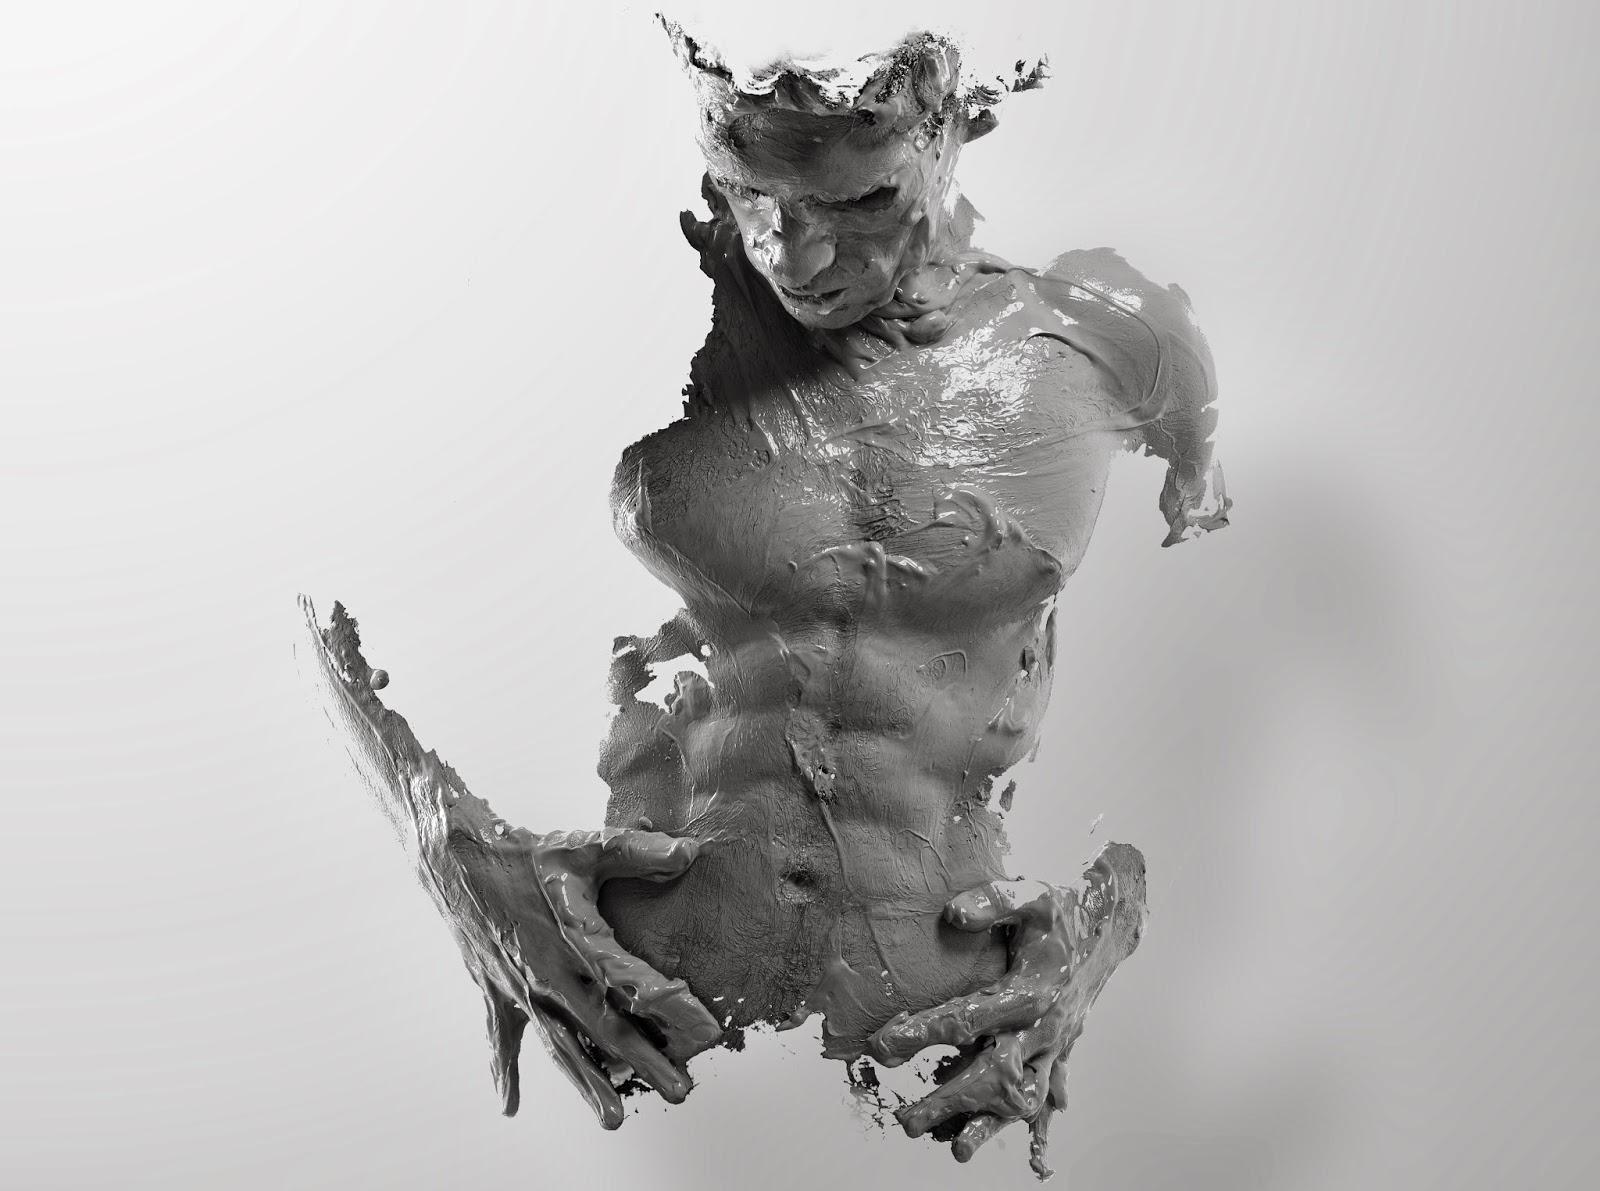 Men art downlod picture 40